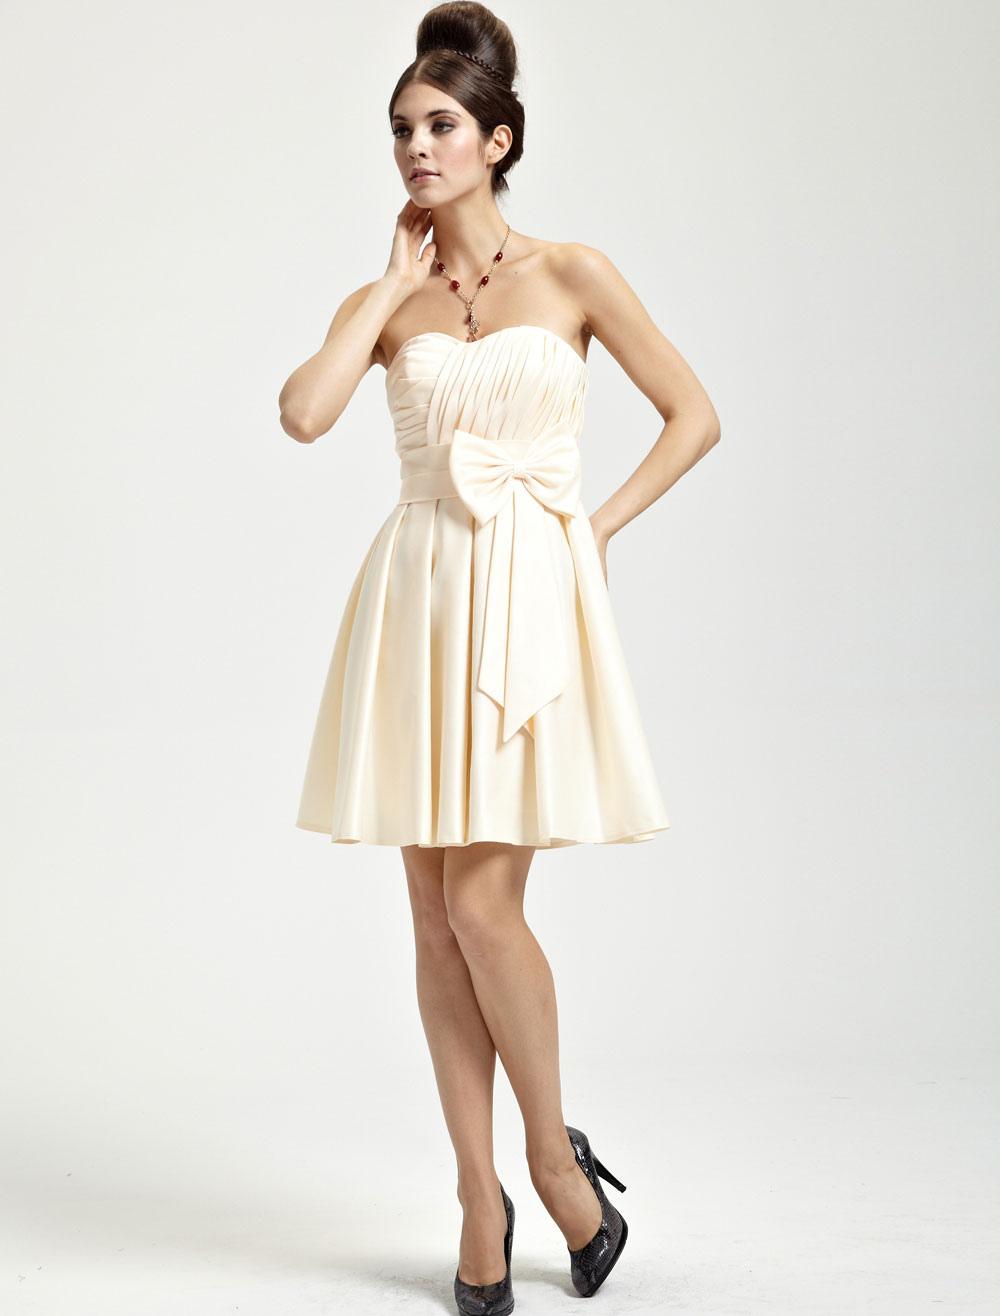 Gold Champagne Satin Bow Sweetheart Short Bridesmaid Dress (Wedding Bridesmaid Dresses) photo